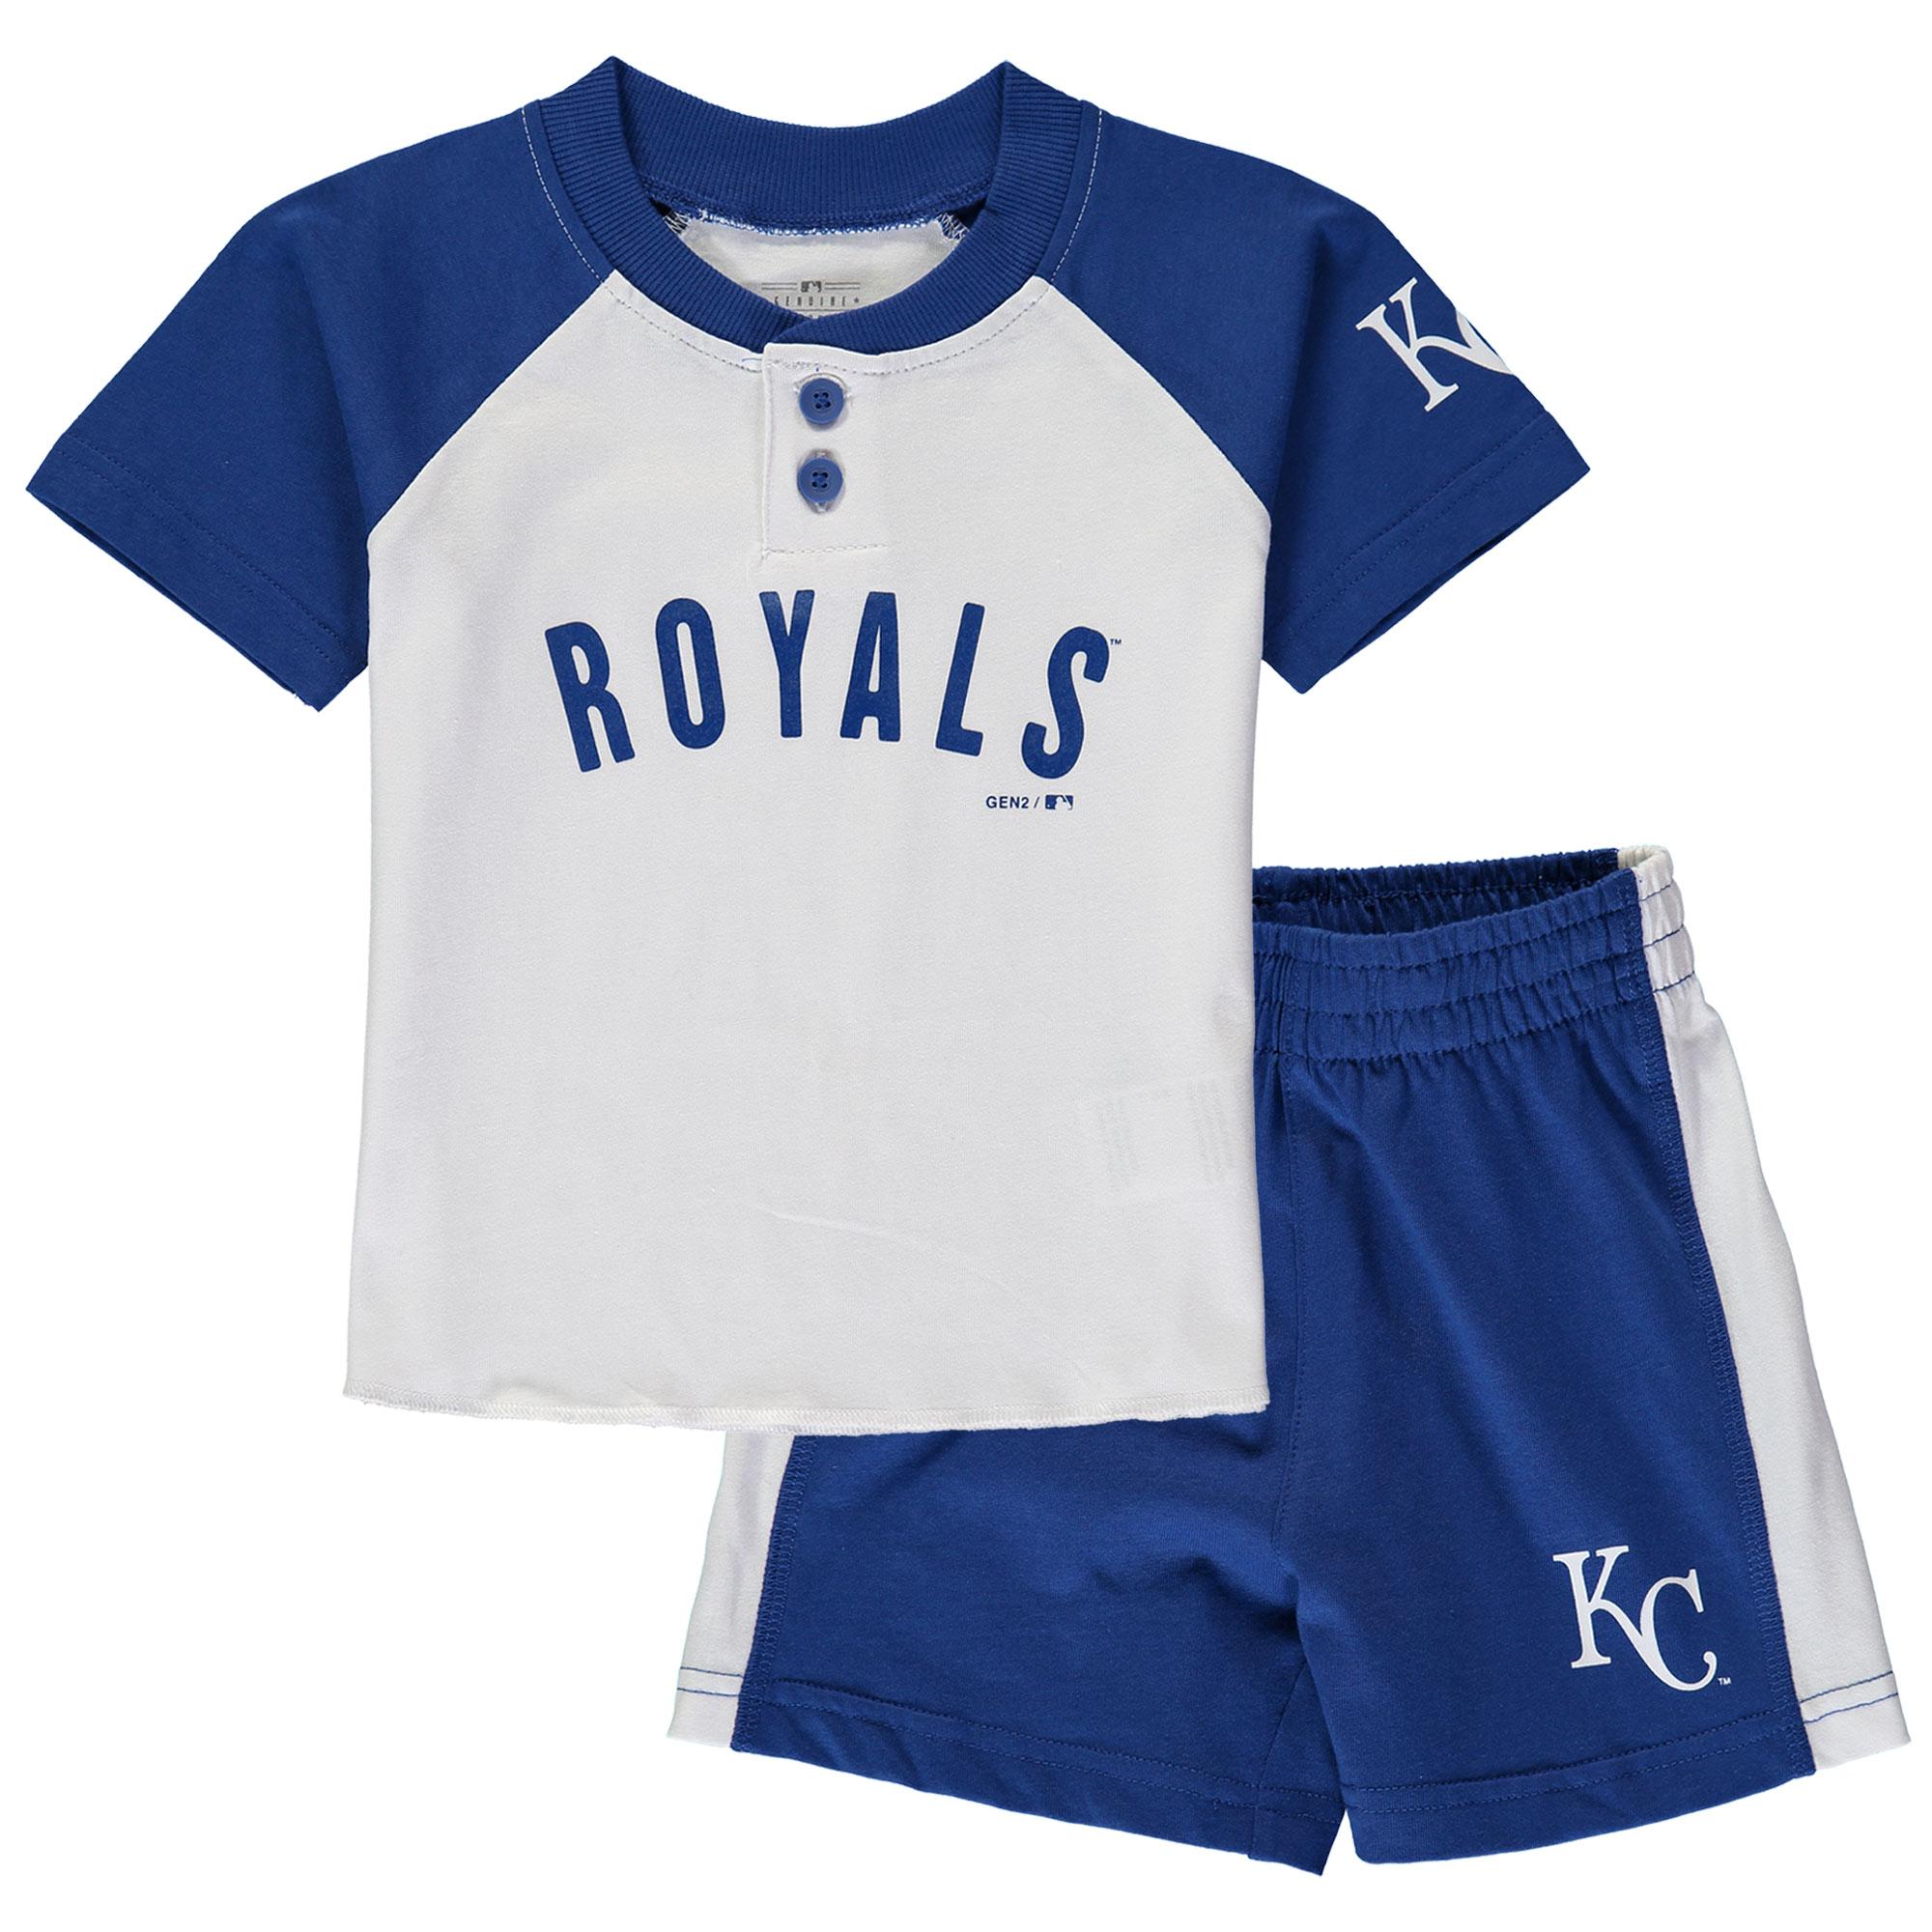 Kansas City Royals Toddler Good Hit Henley T-Shirt & Shorts Set - White/Royal